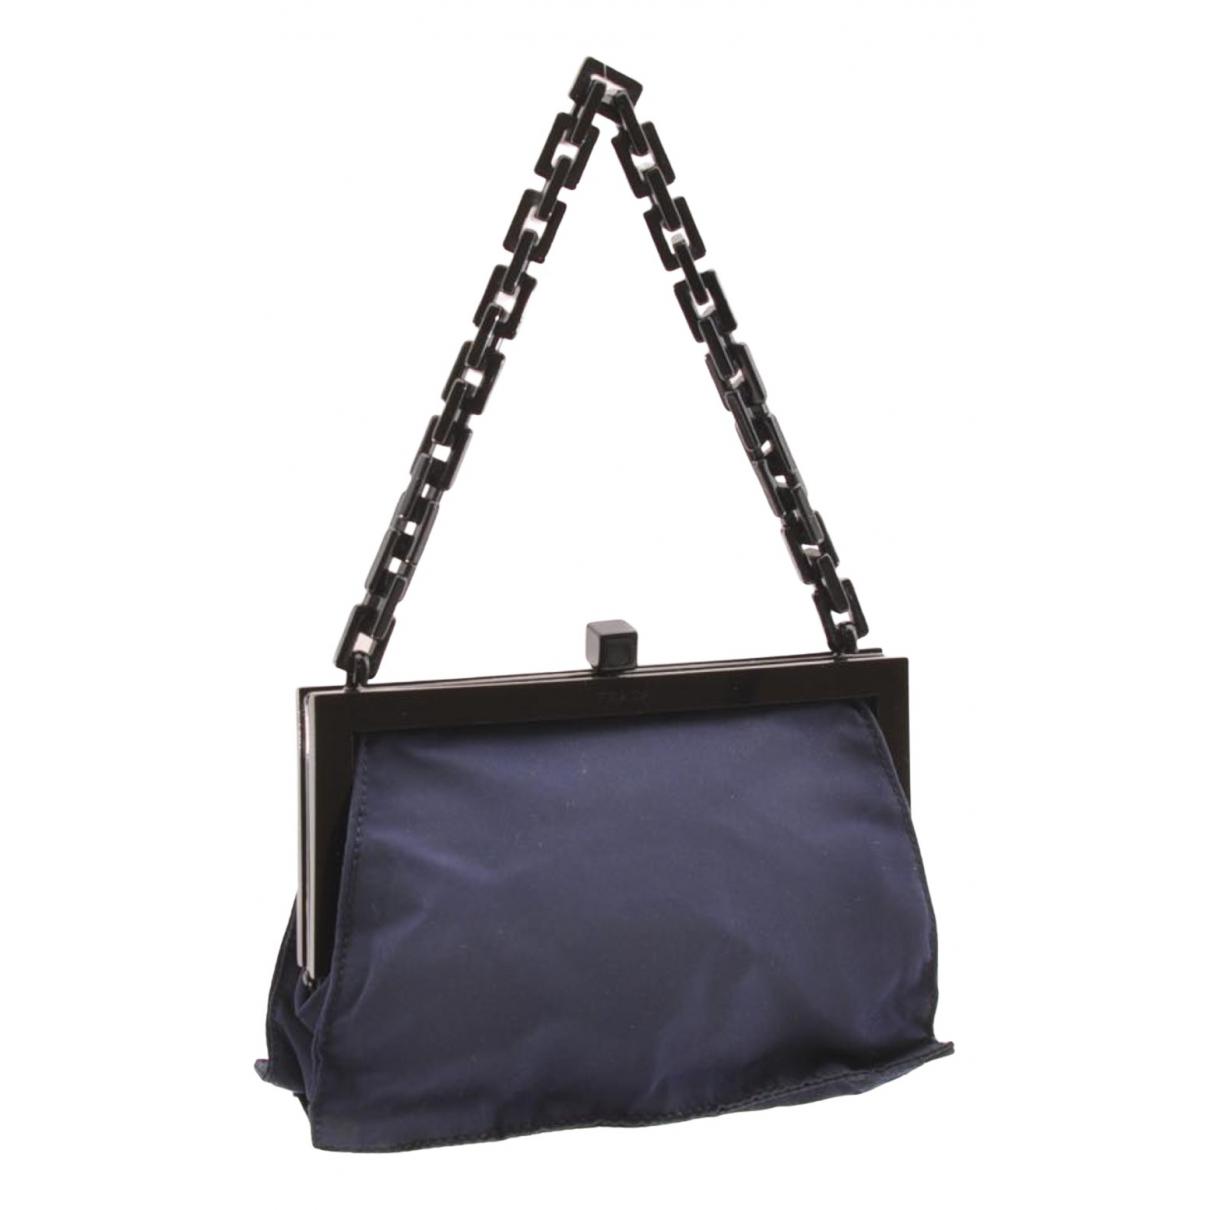 Prada N Navy handbag for Women N